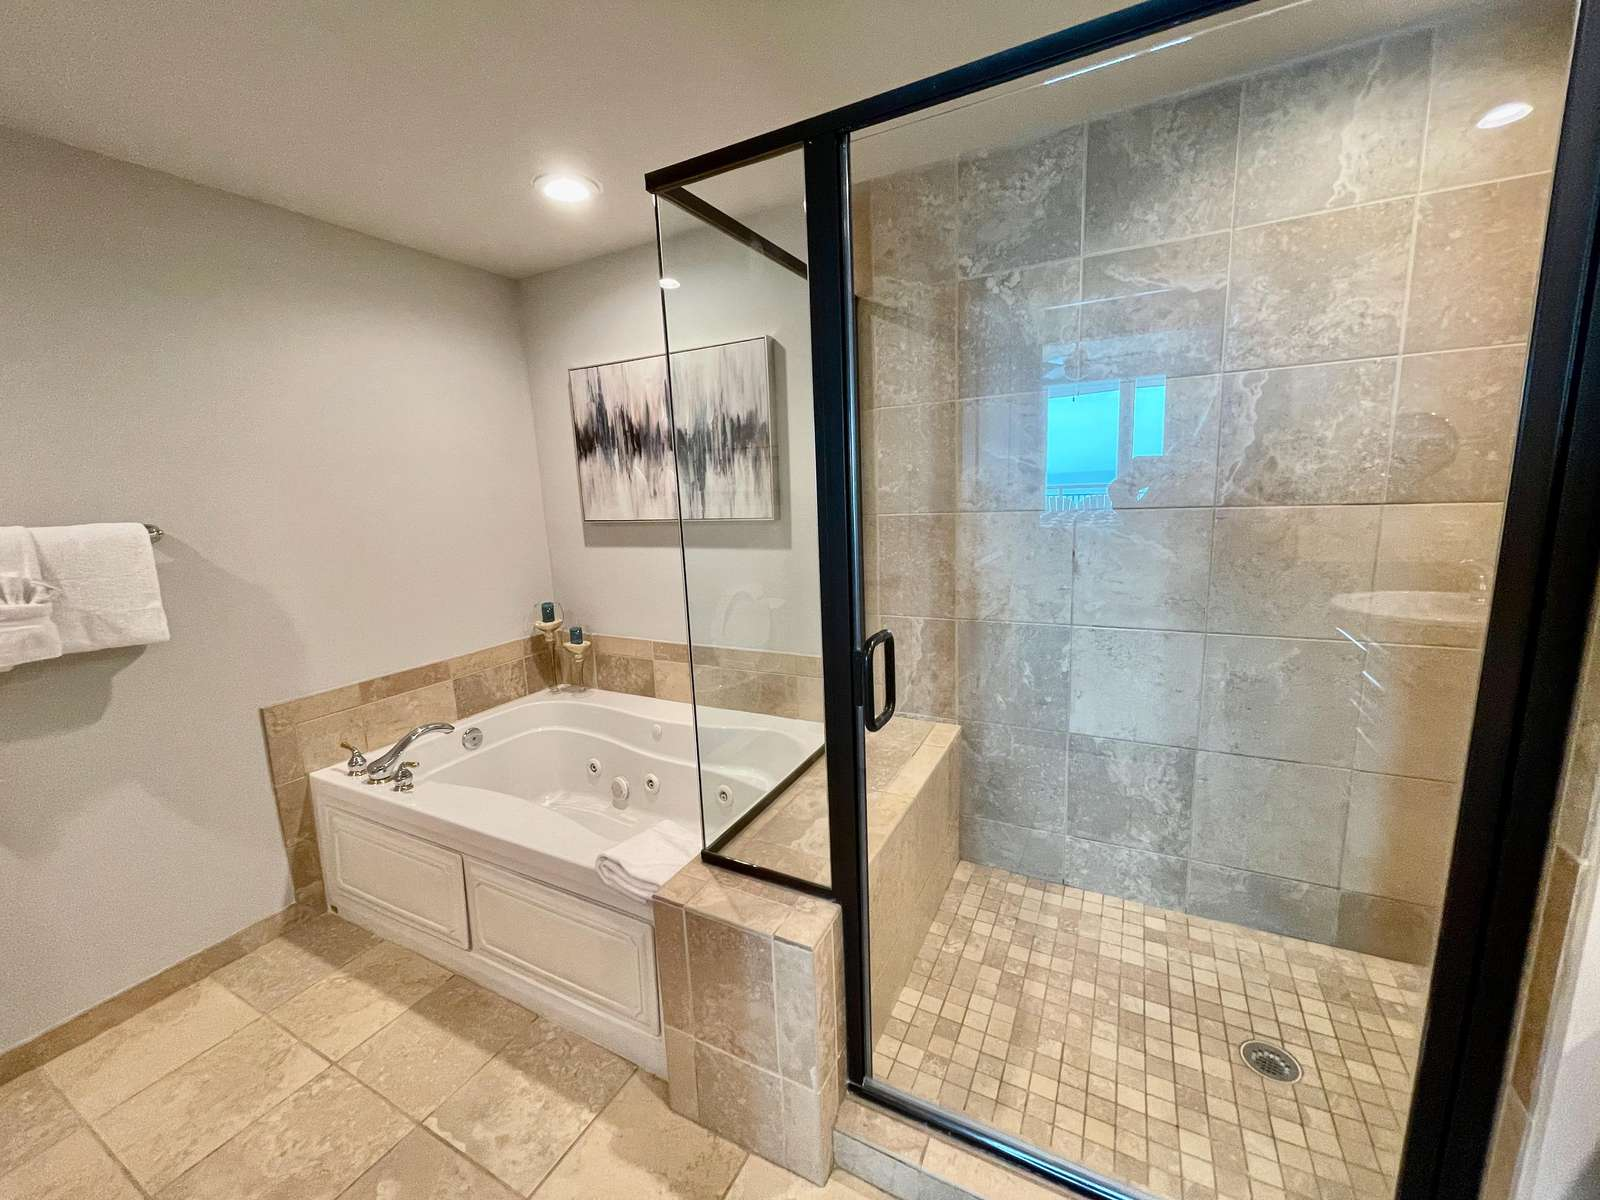 Stall shower, ceramic, jetted tub